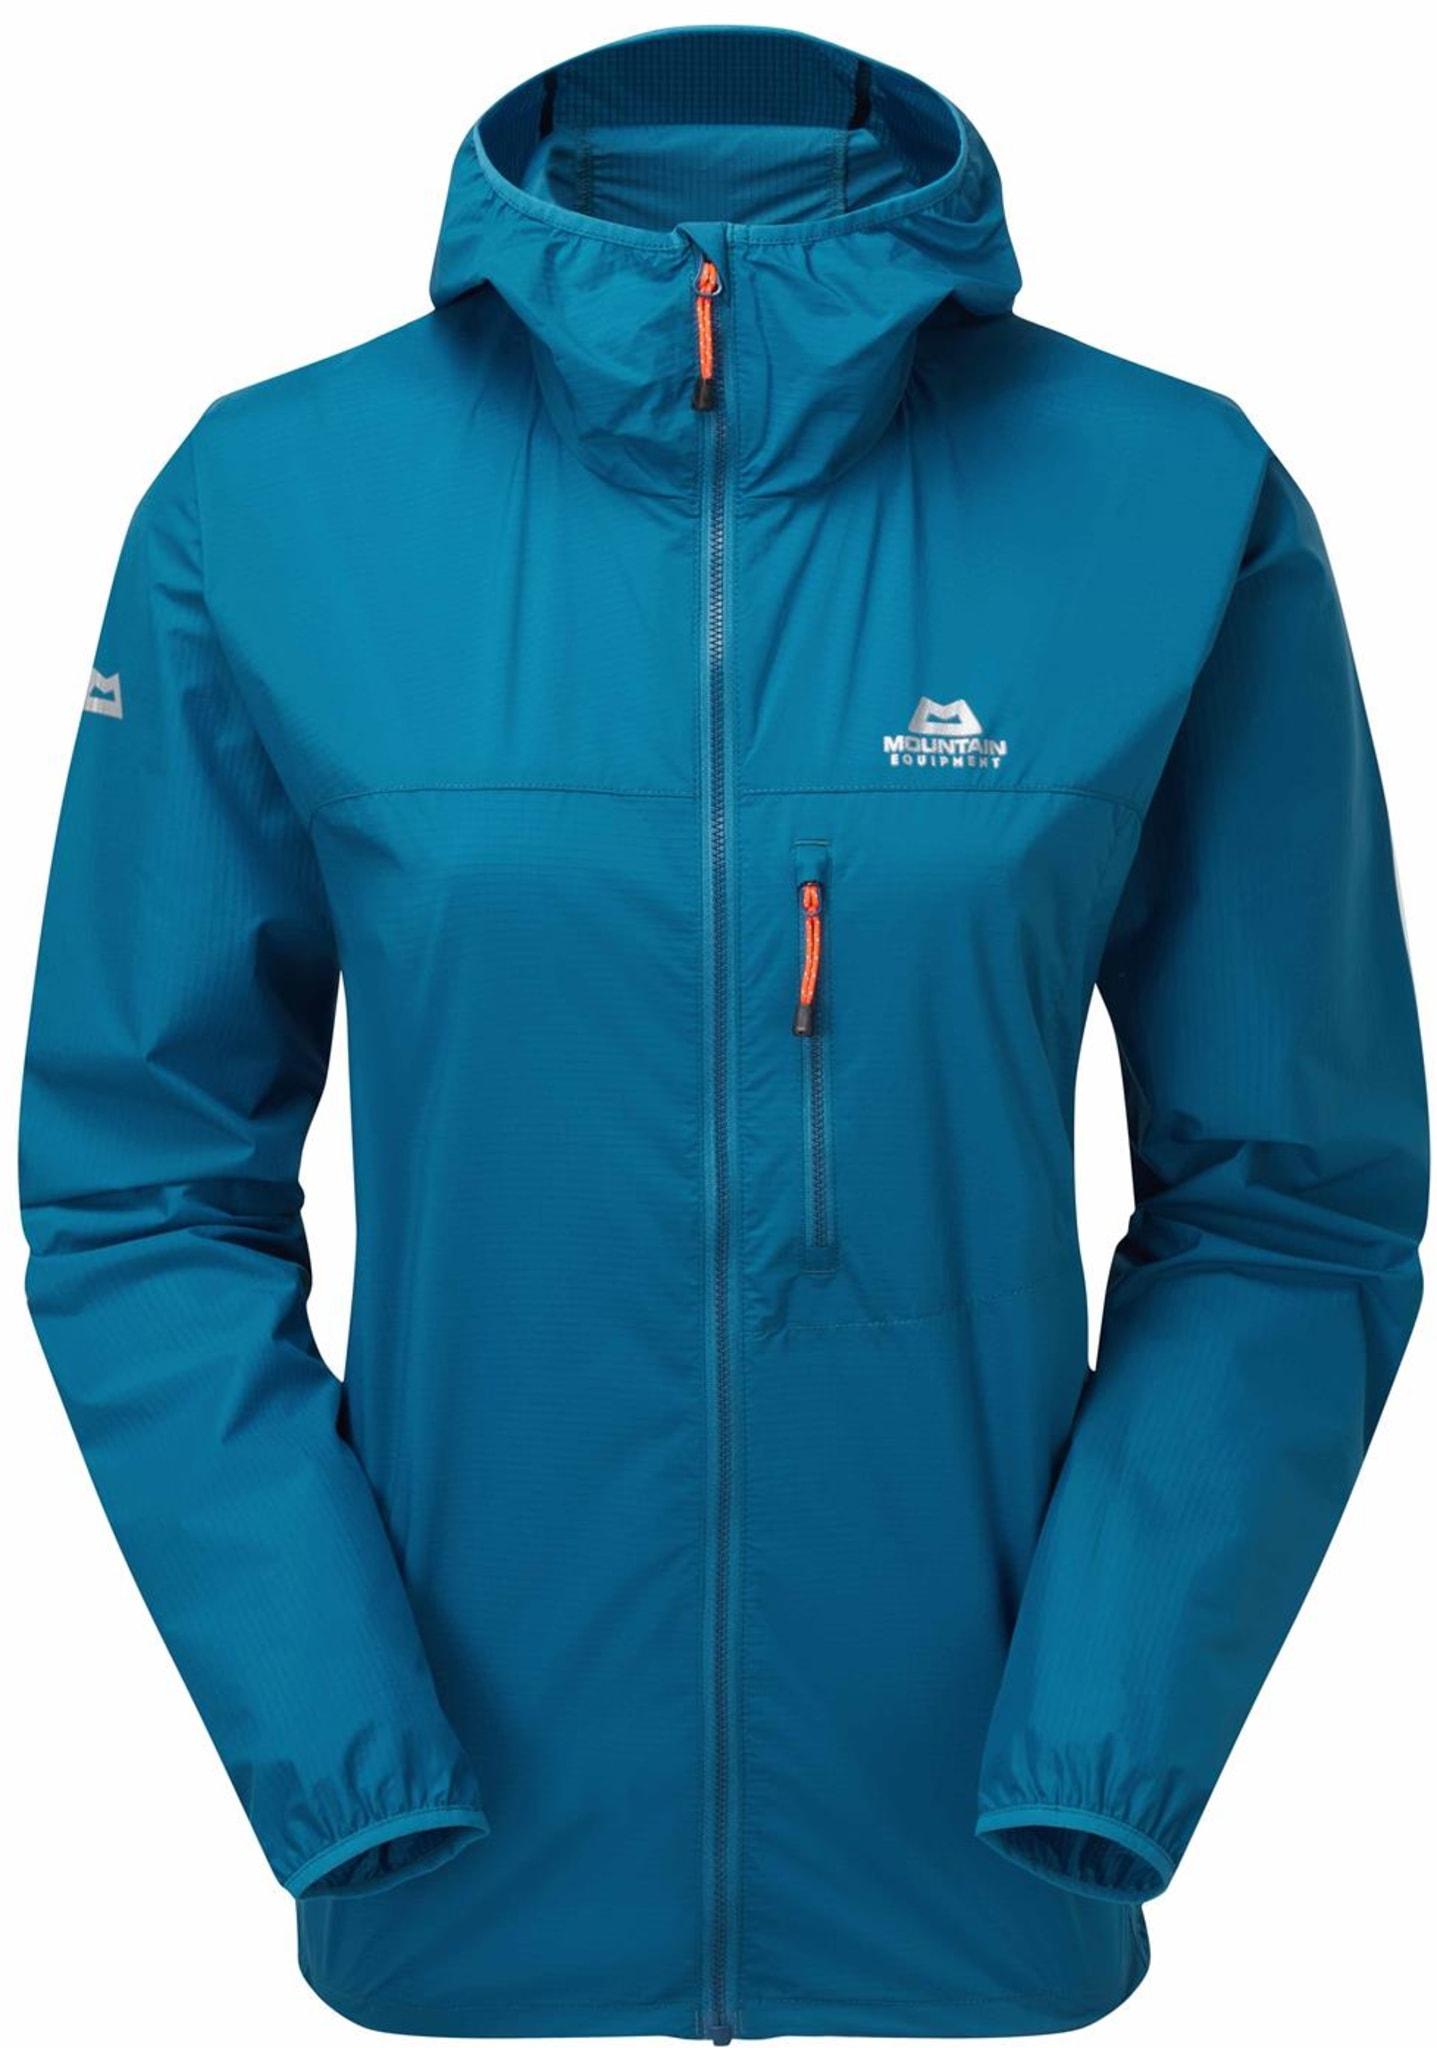 Aerofoil Full zip Jacket Ws